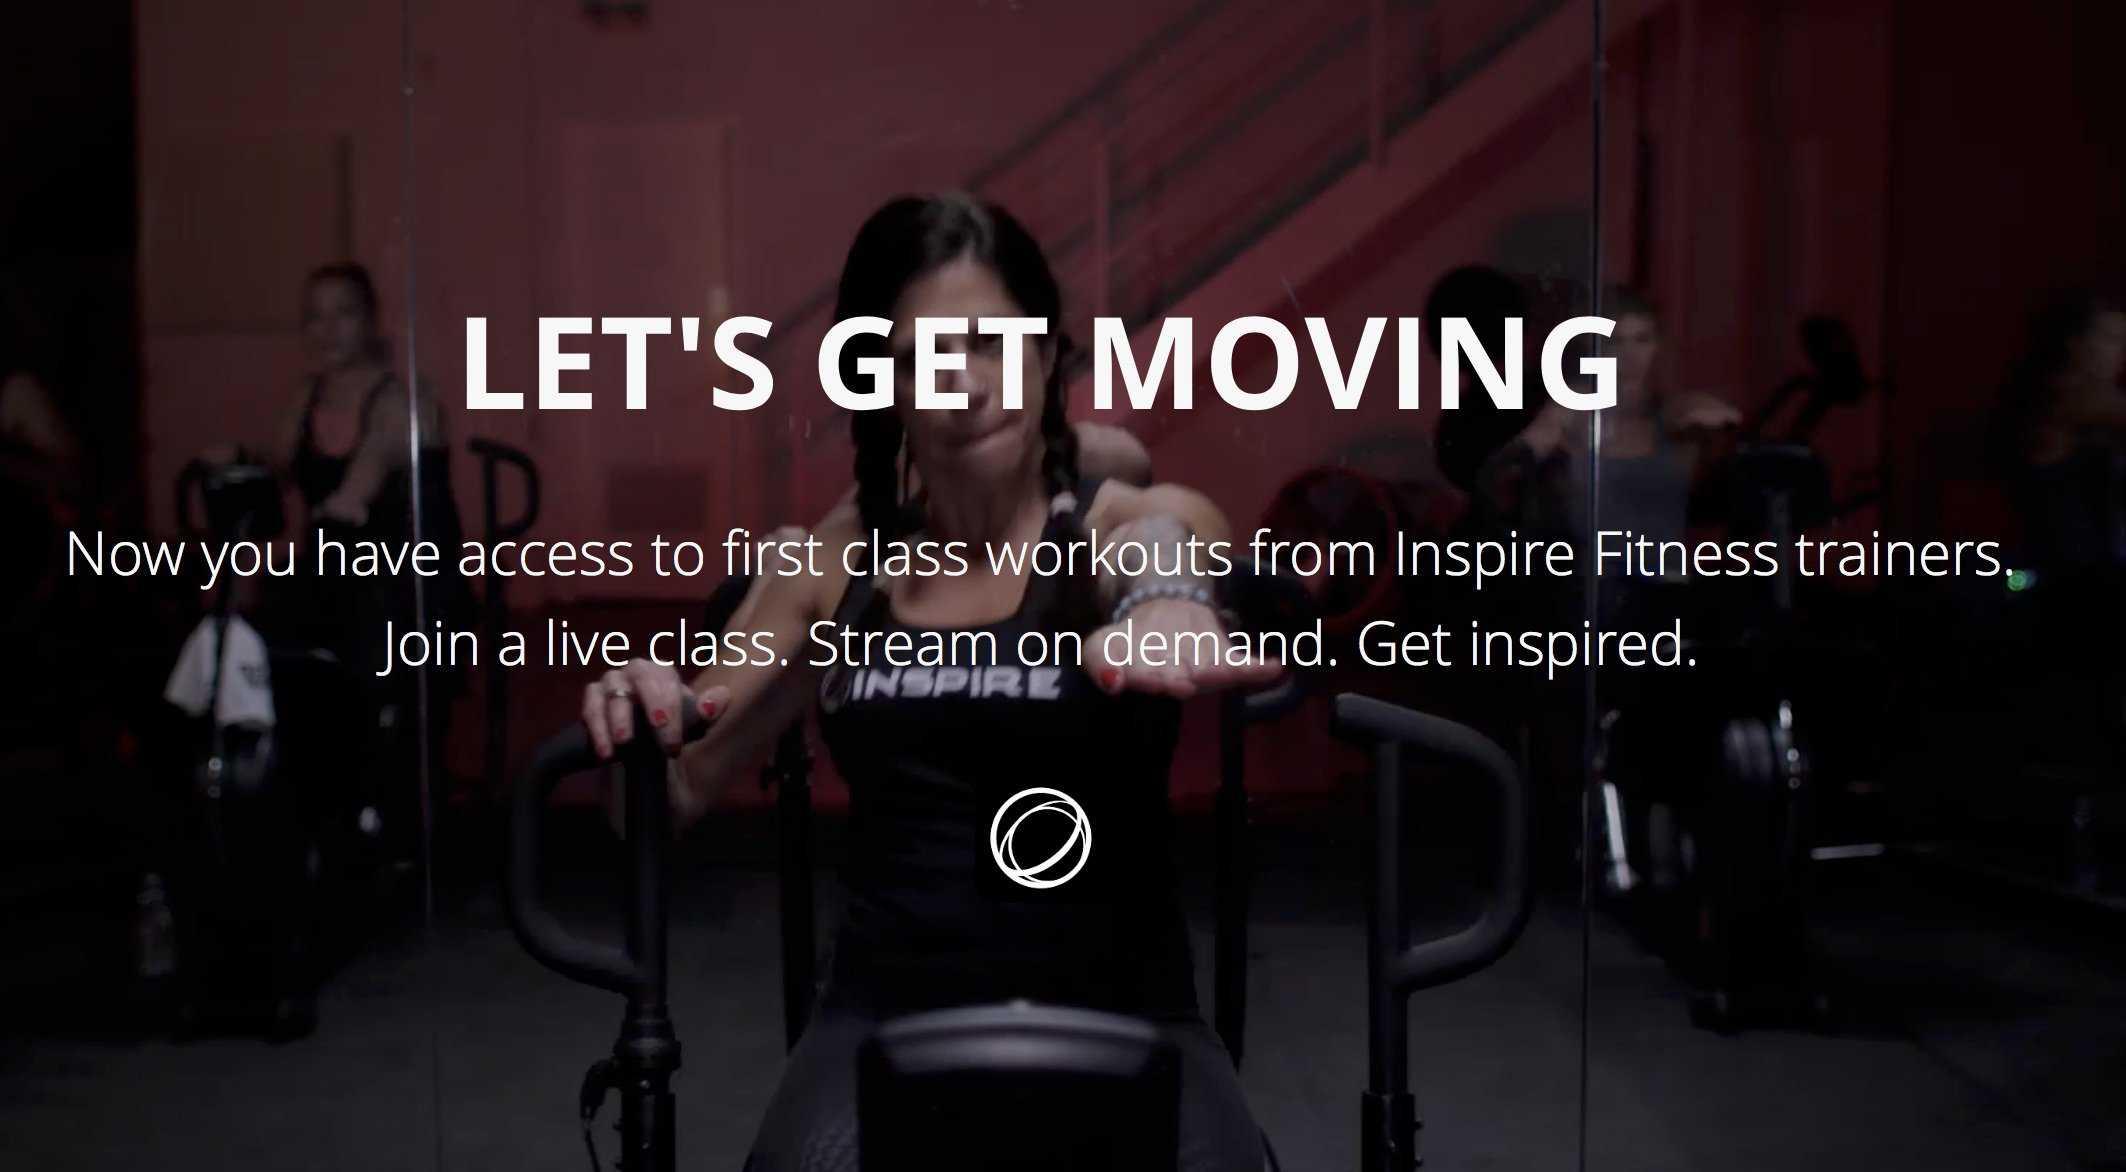 Inspire Fitness CR2 Cross Rowing Machine App